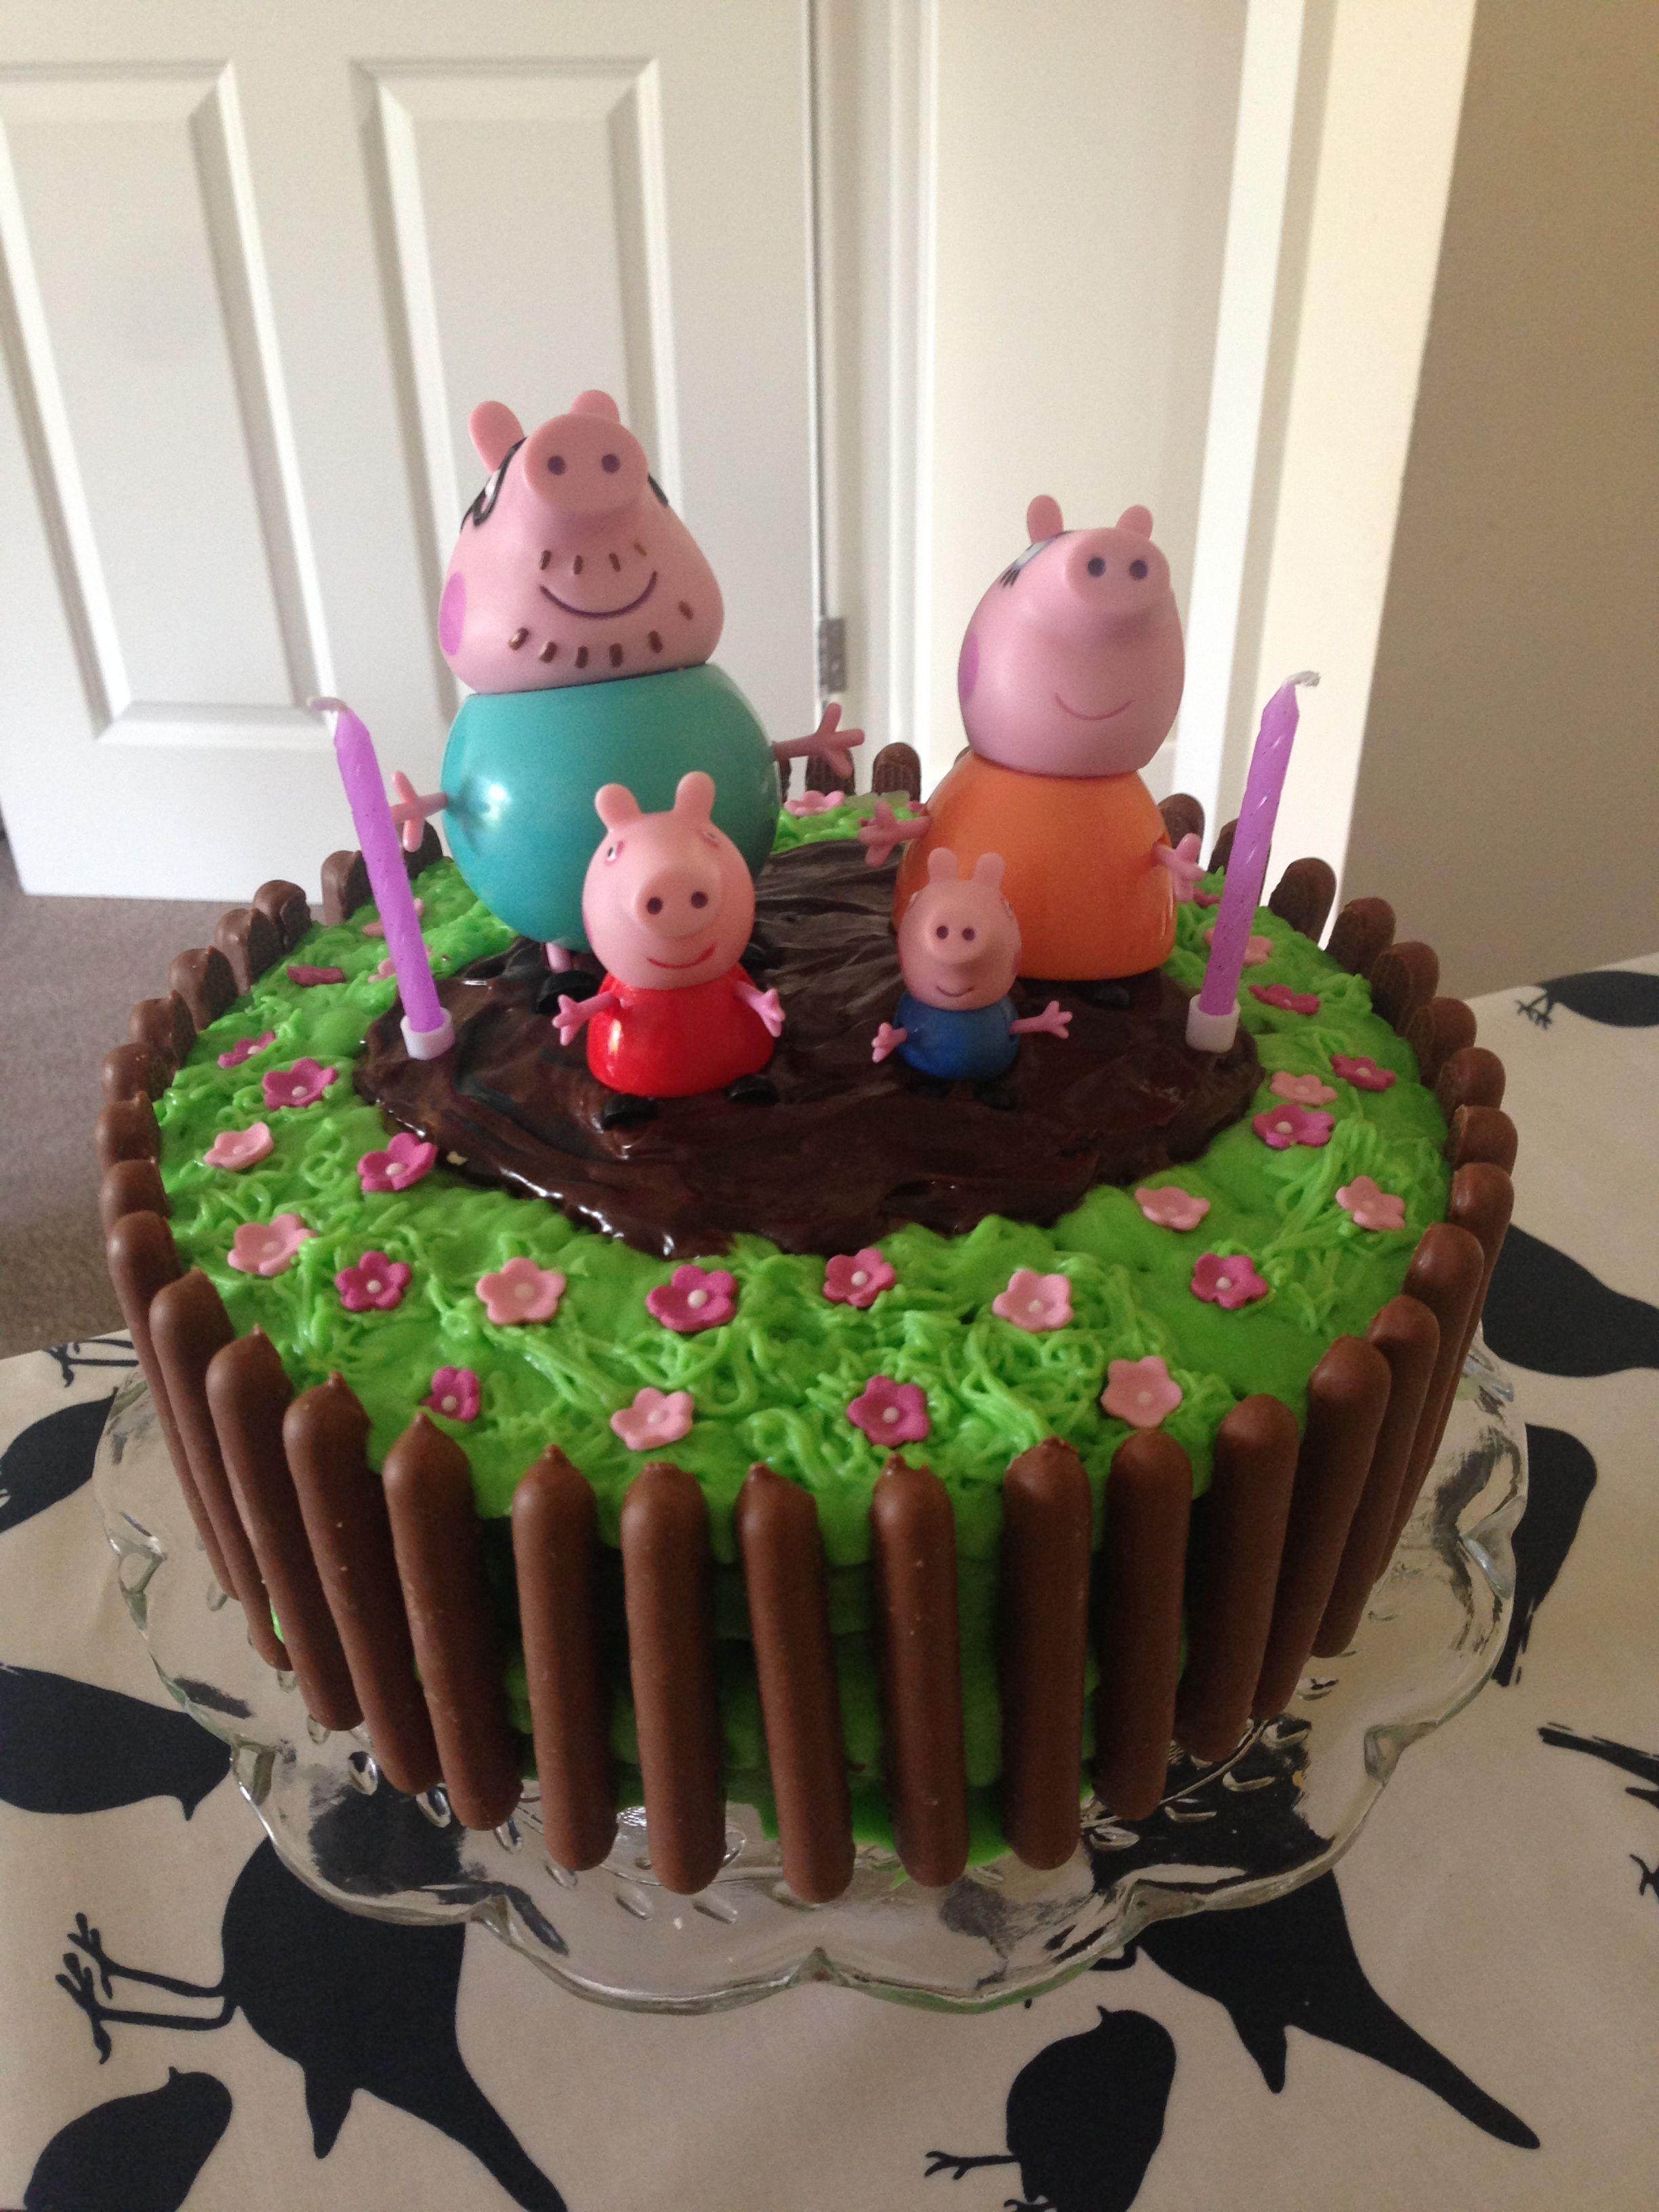 Peppa Pig Muddy Puddle Cake Cake Cake And More Cake